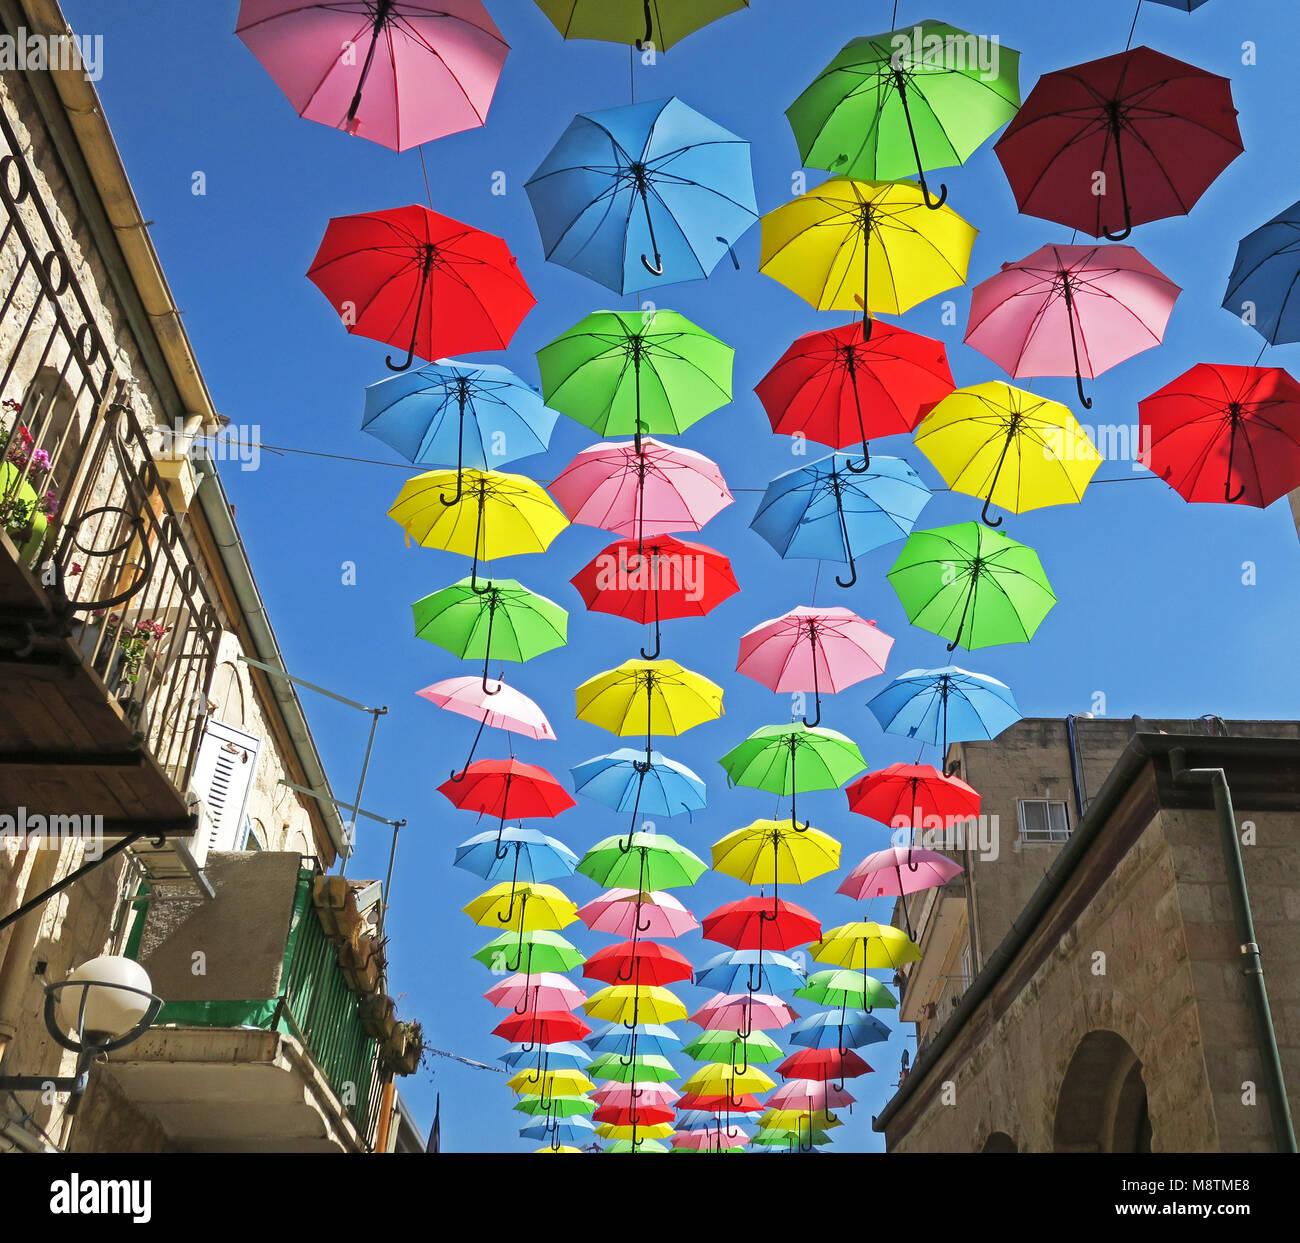 Summer street festival with flying umbrellas in Jerusalem - Stock Image